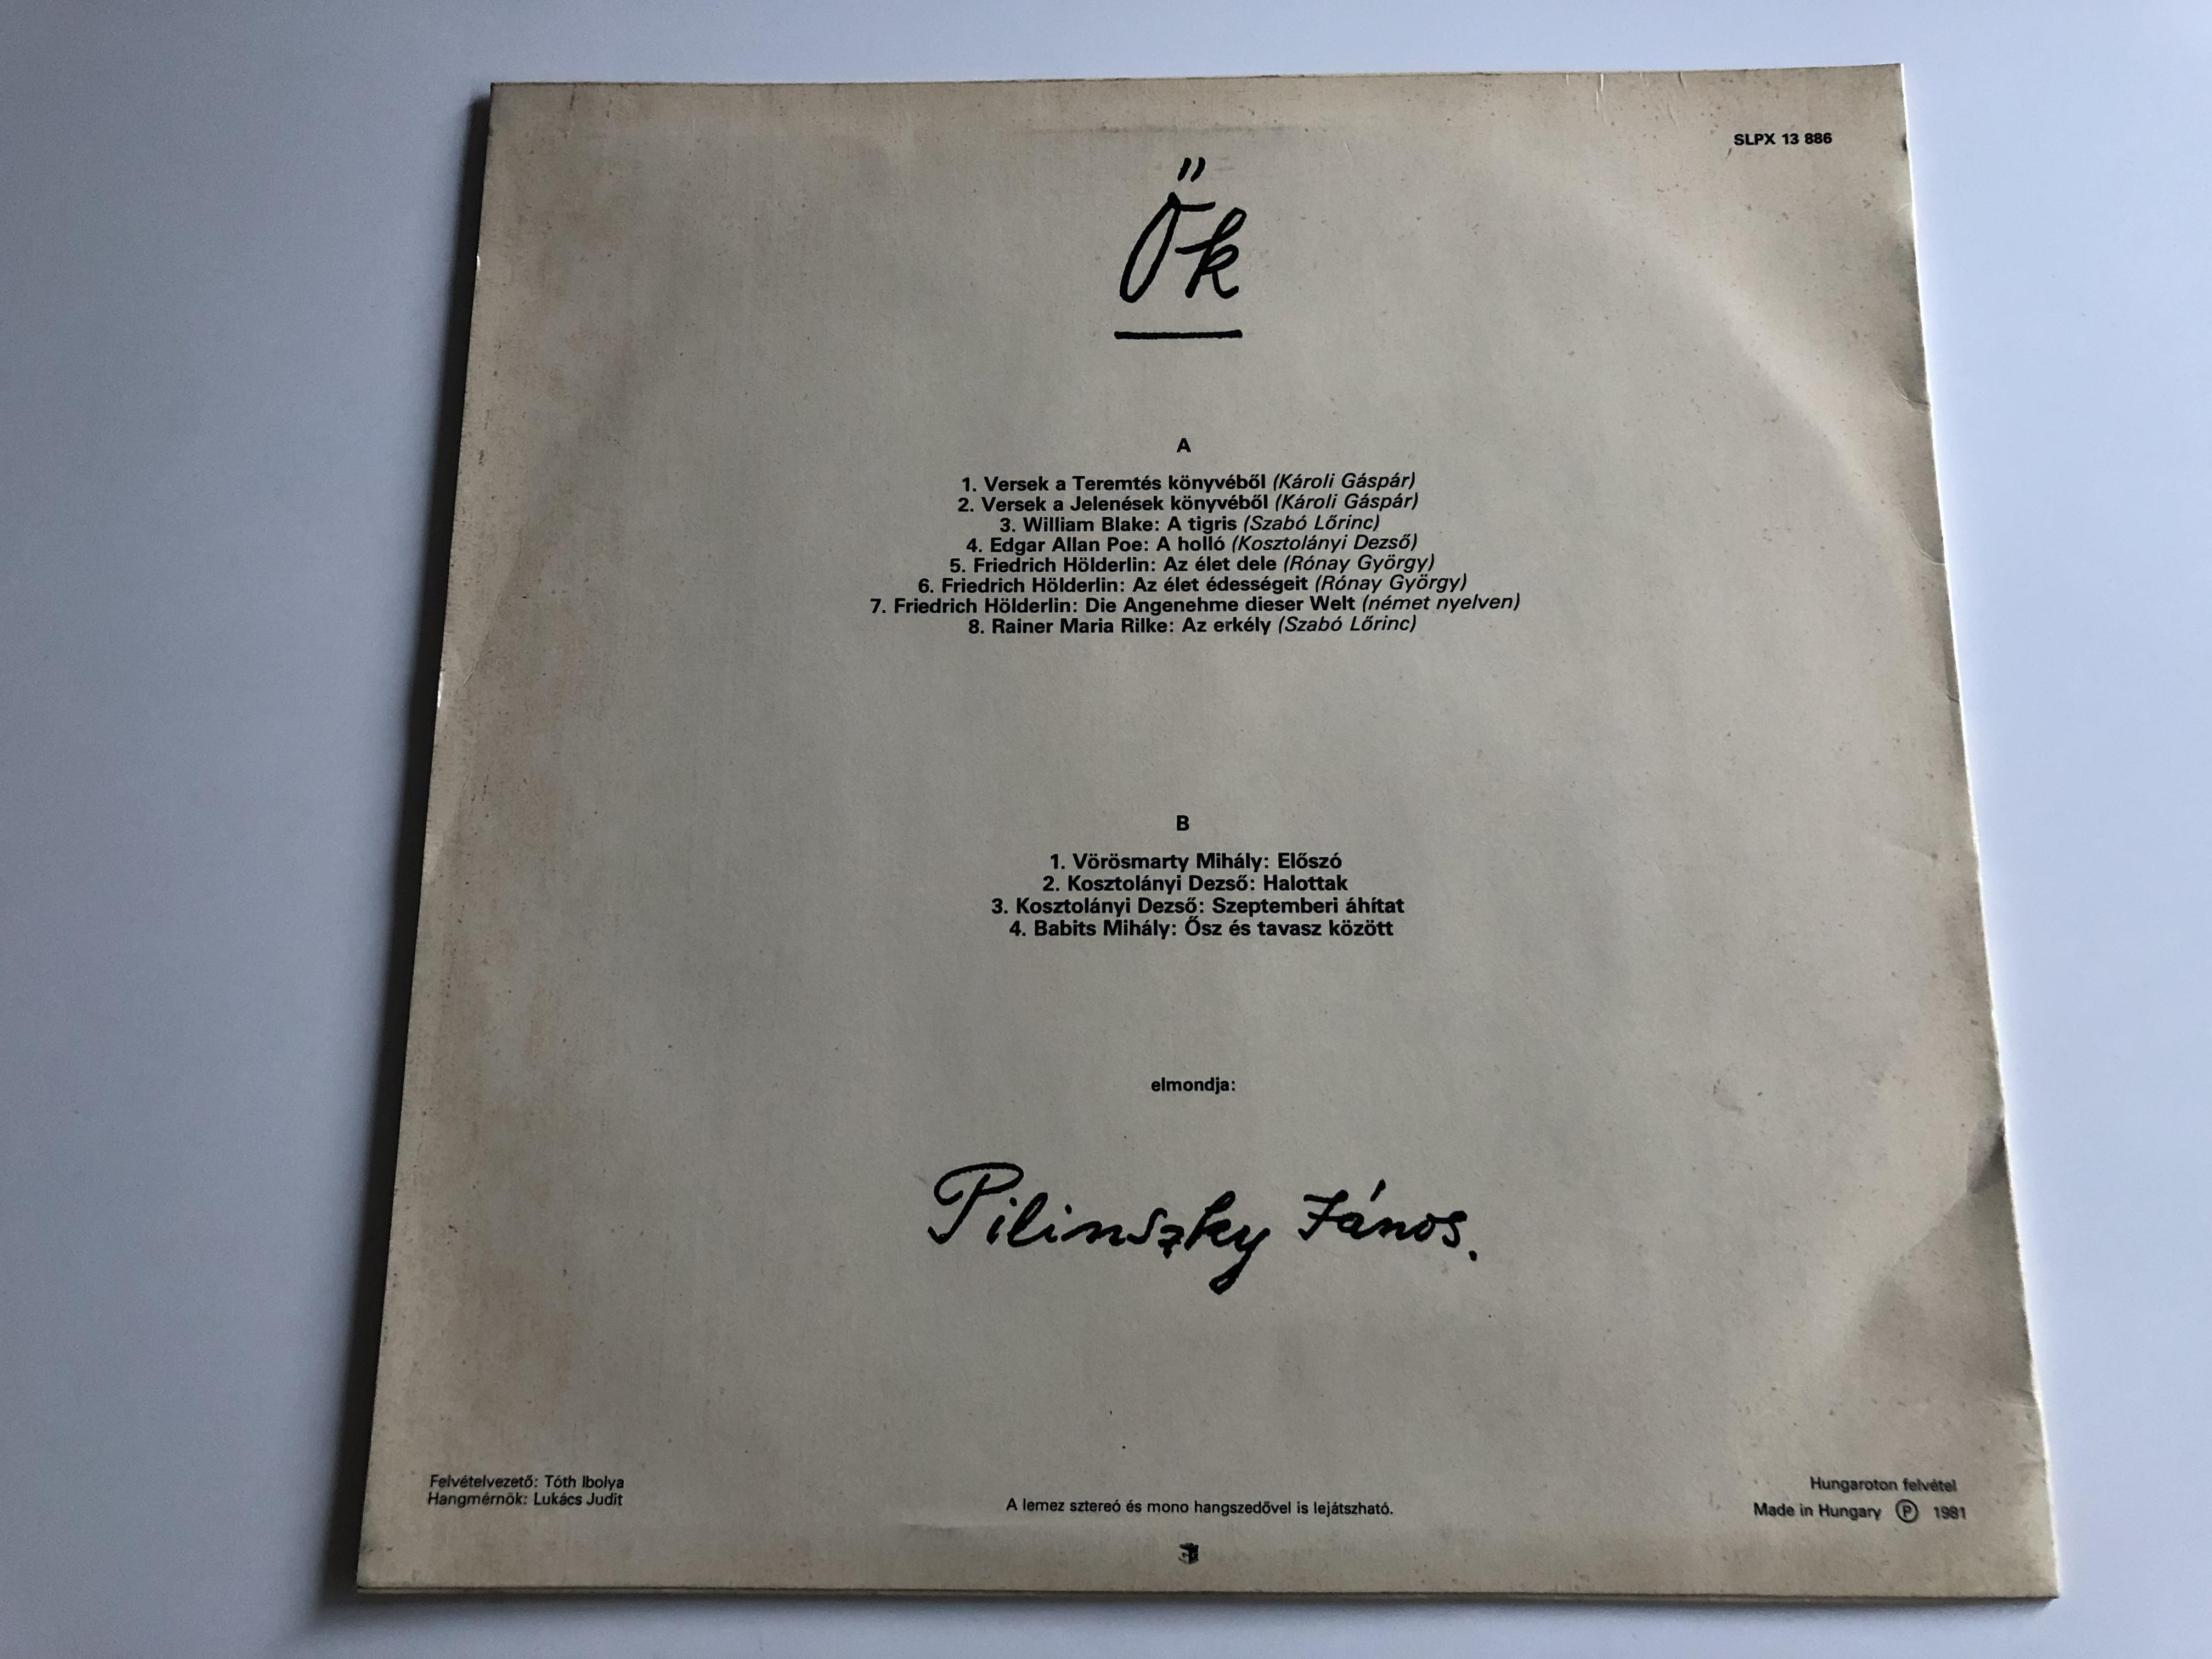 pilinszky-j-nos-k-hungaroton-lp-stereo-slpx-13-886-2-.jpg